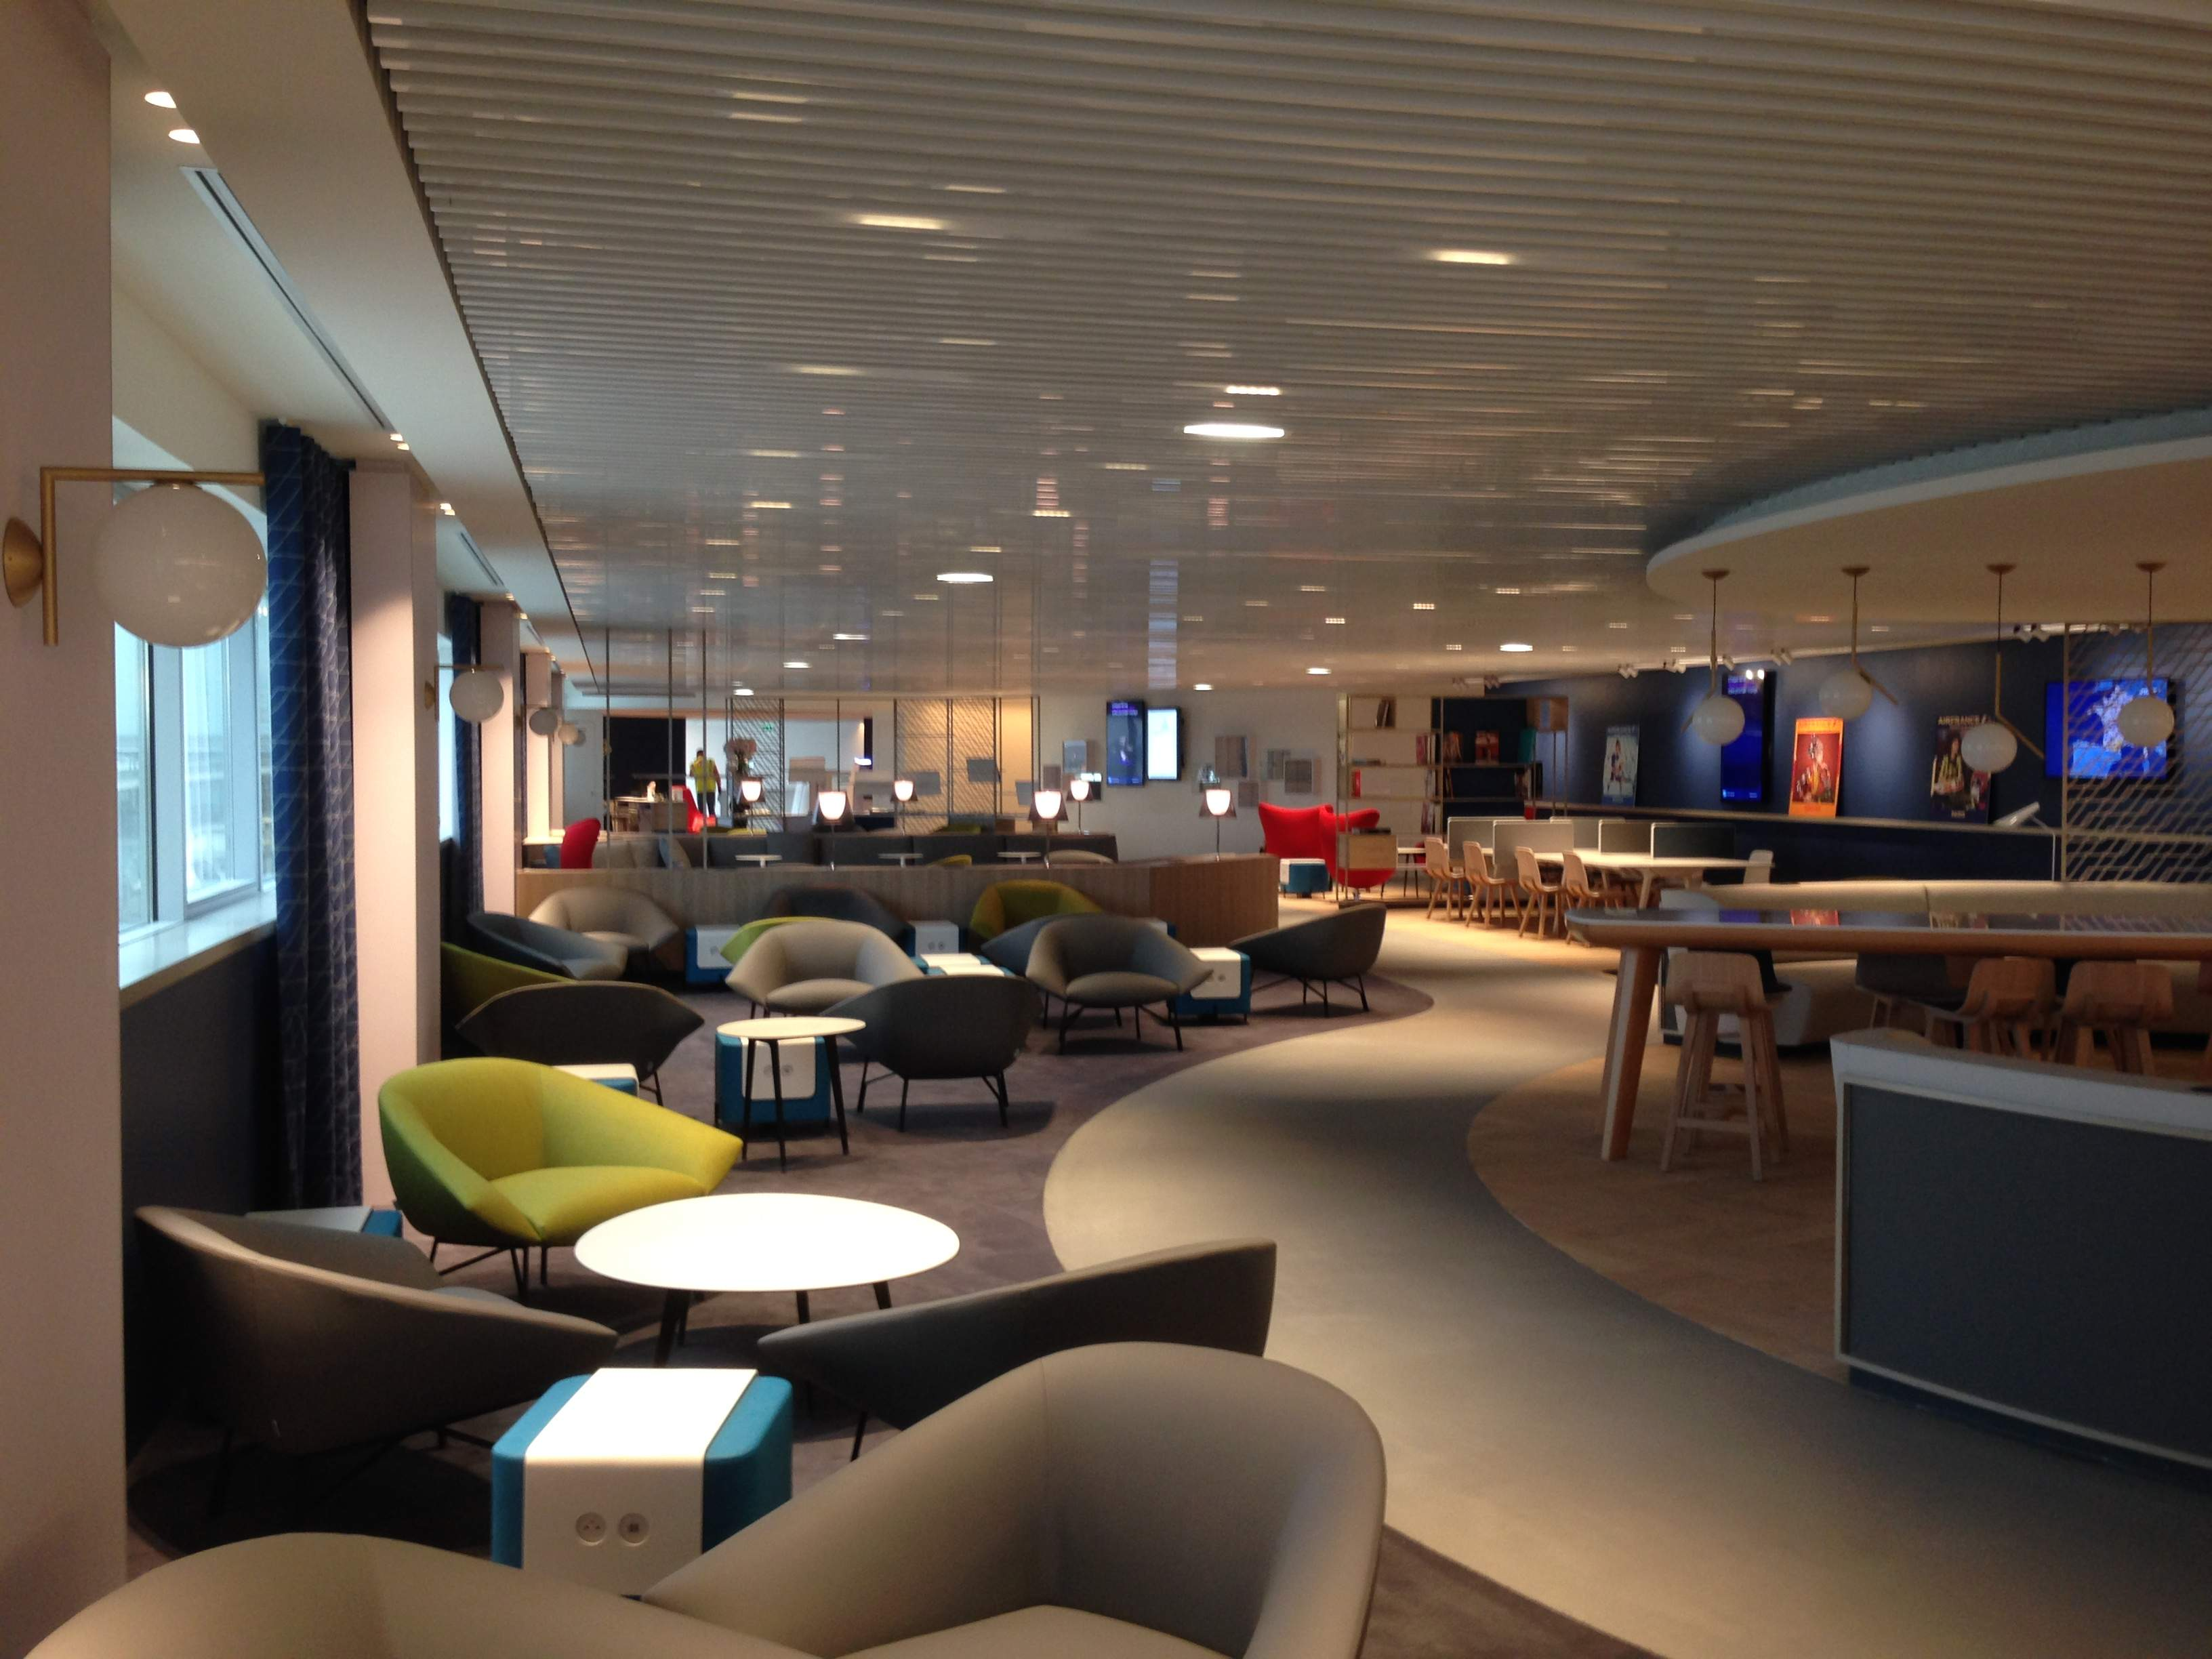 hotellerie salon air france terminal 2g axys. Black Bedroom Furniture Sets. Home Design Ideas